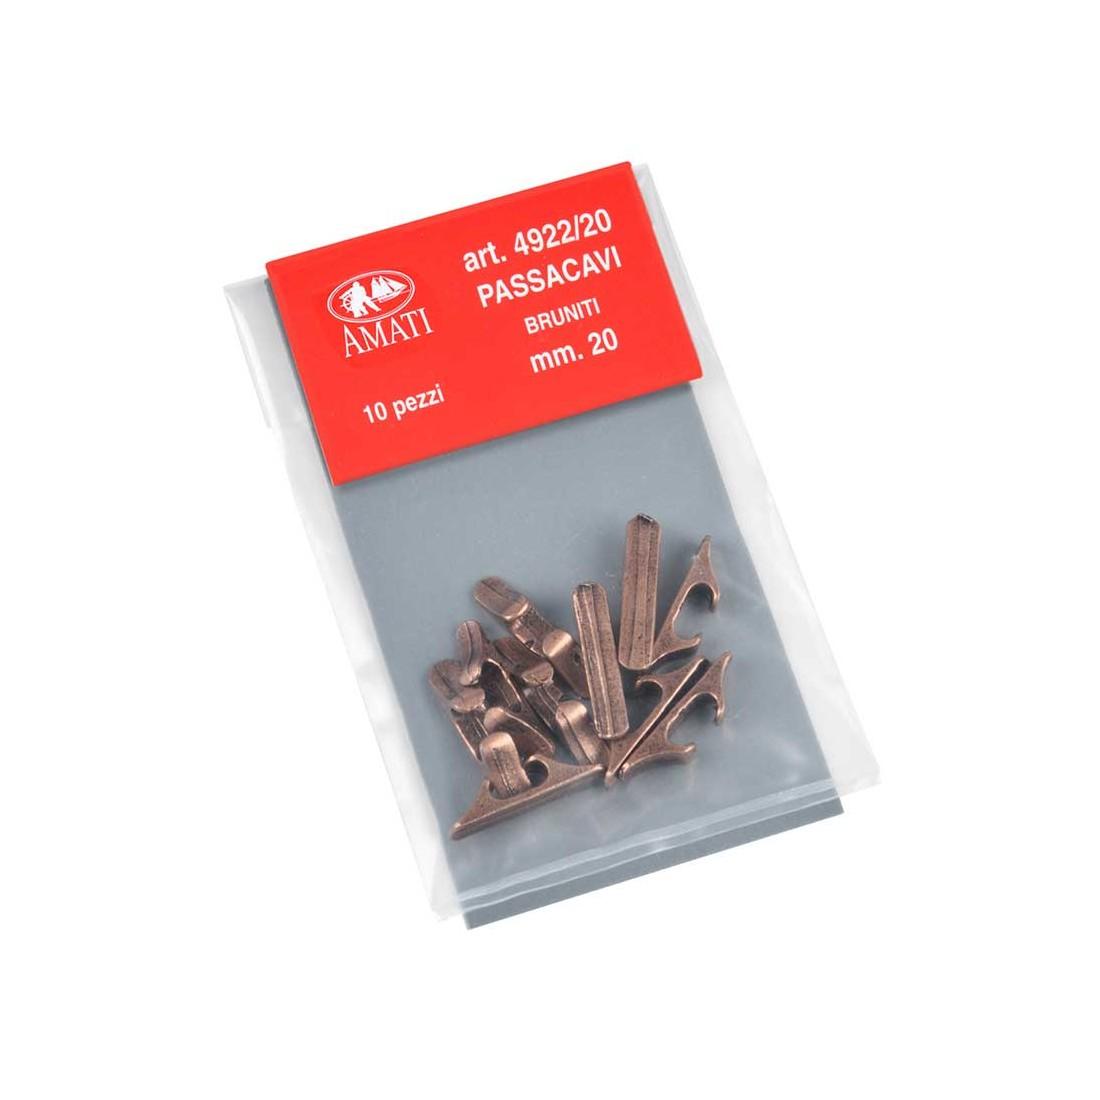 Calzos de metal bruñidos mm.20